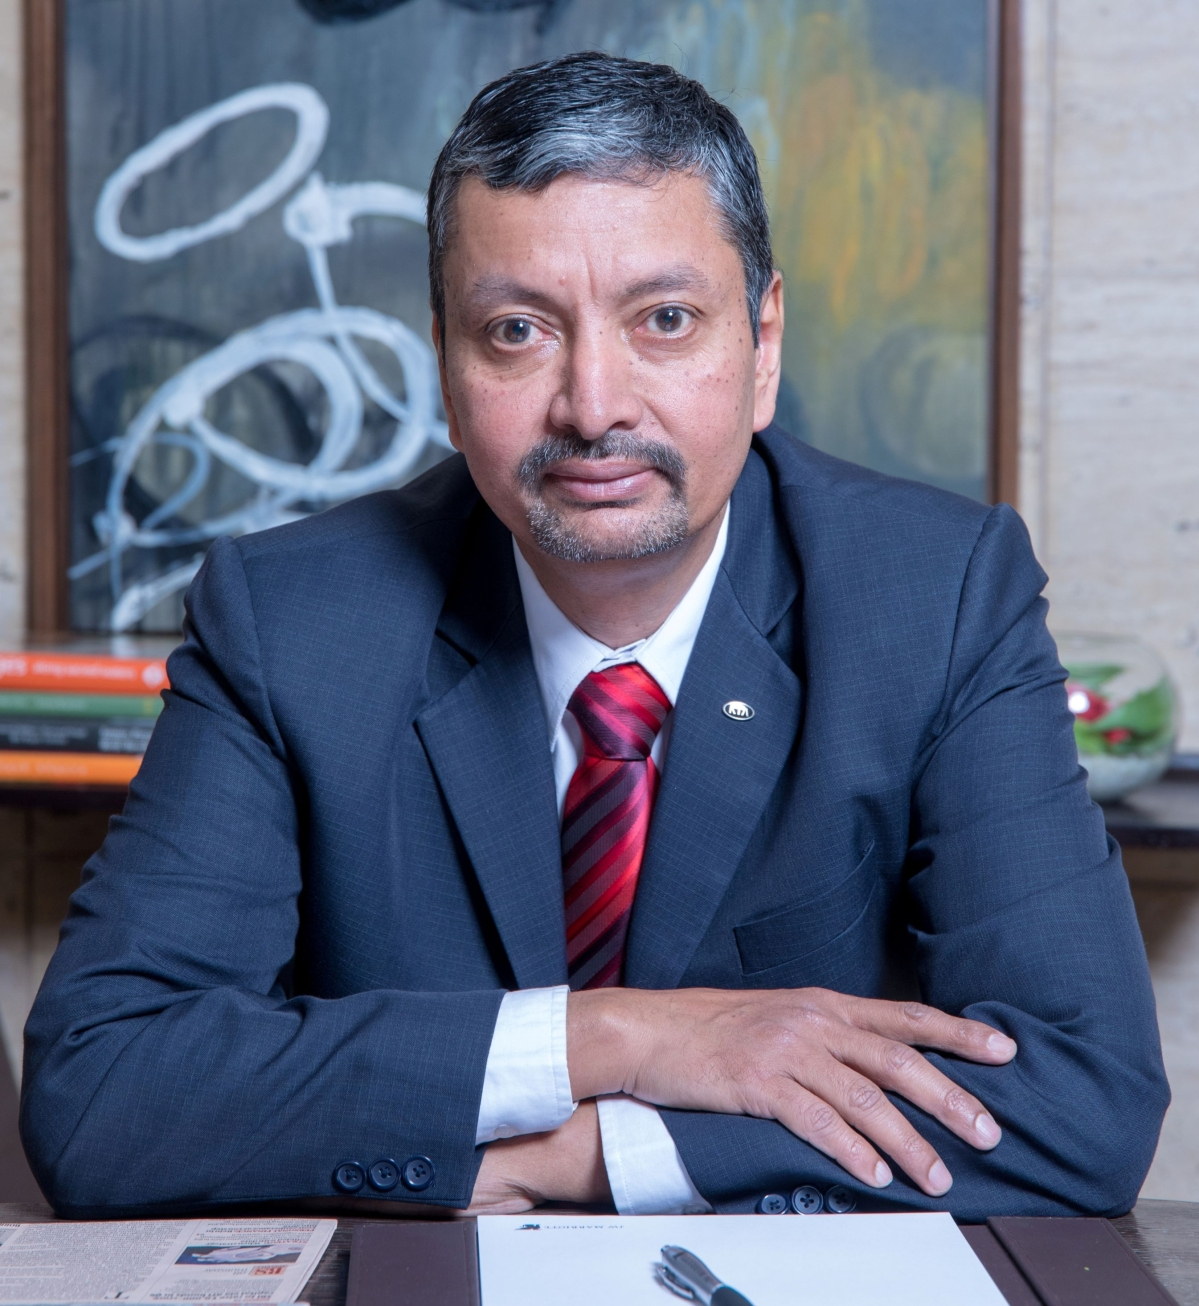 Manohar Bhat, VP & head of sales and marketing, Kia Motors India